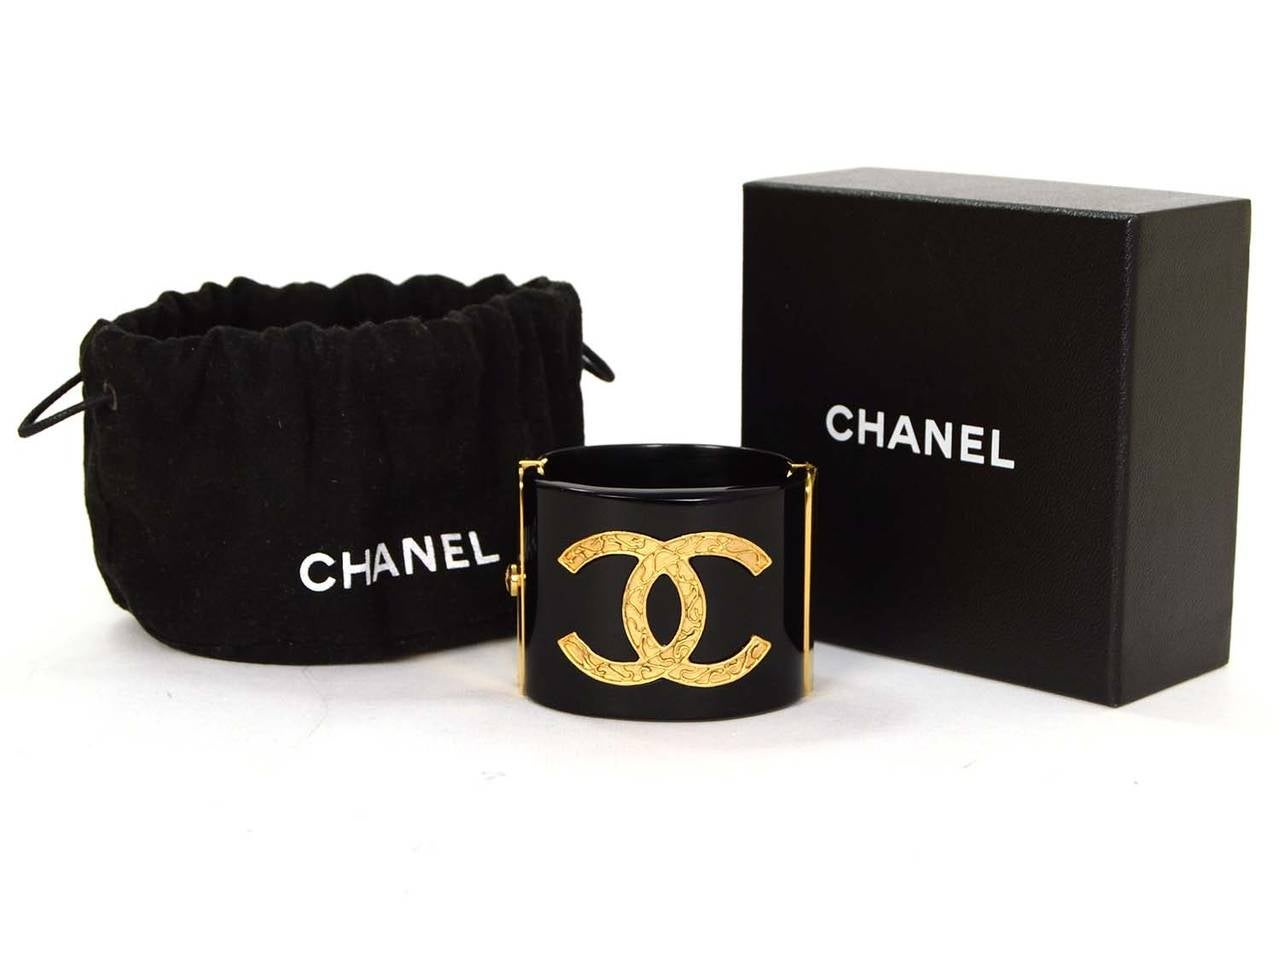 CHANEL Black Resin & Goldtone Cuff Bracelet 6